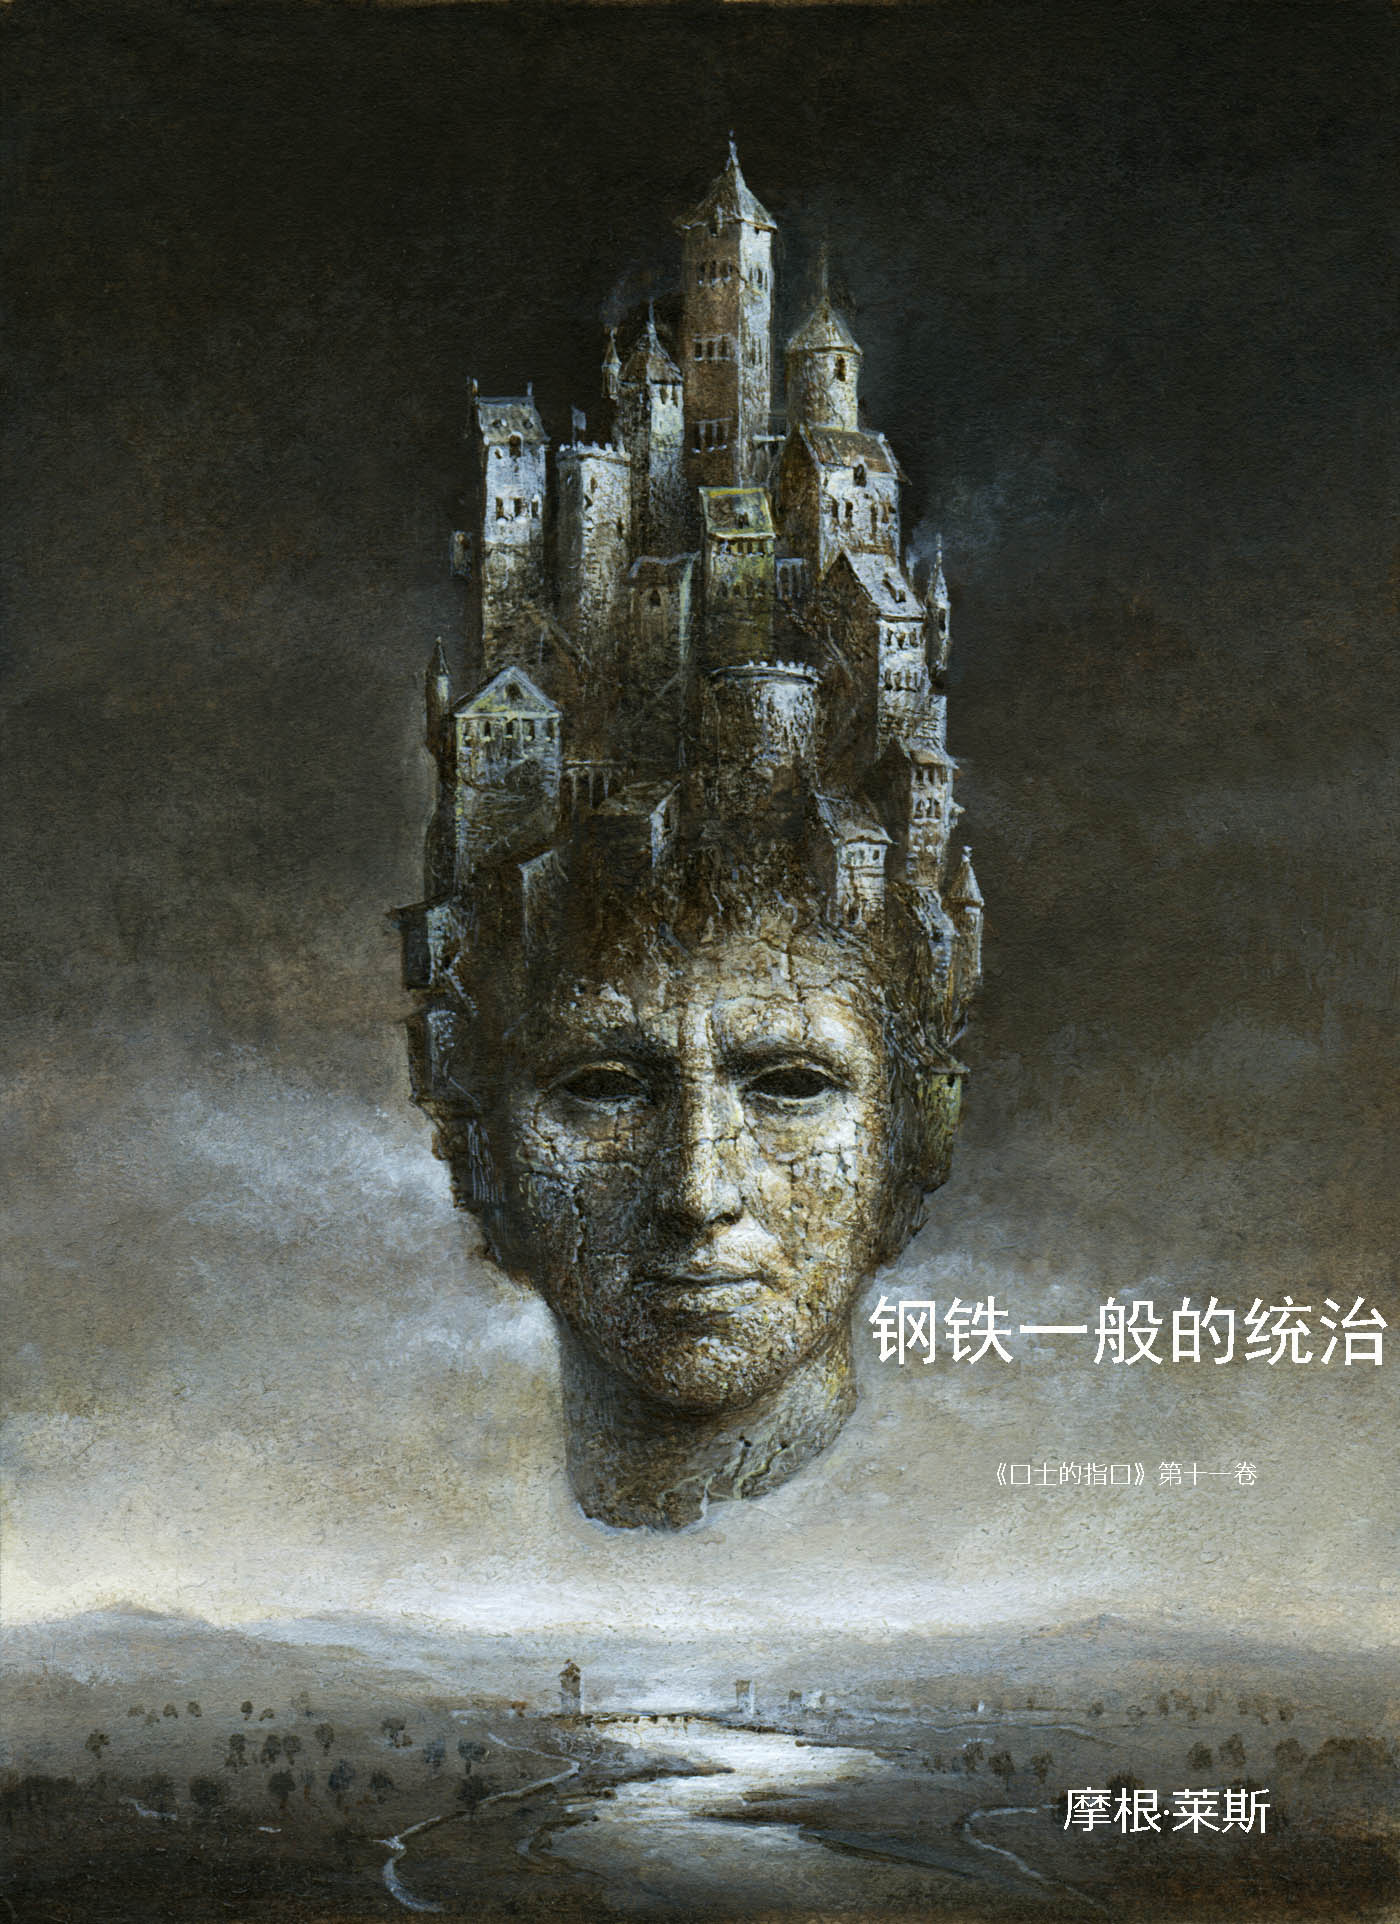 Морган Райс 鋼鐵一般嘅統治 北京旅游指南